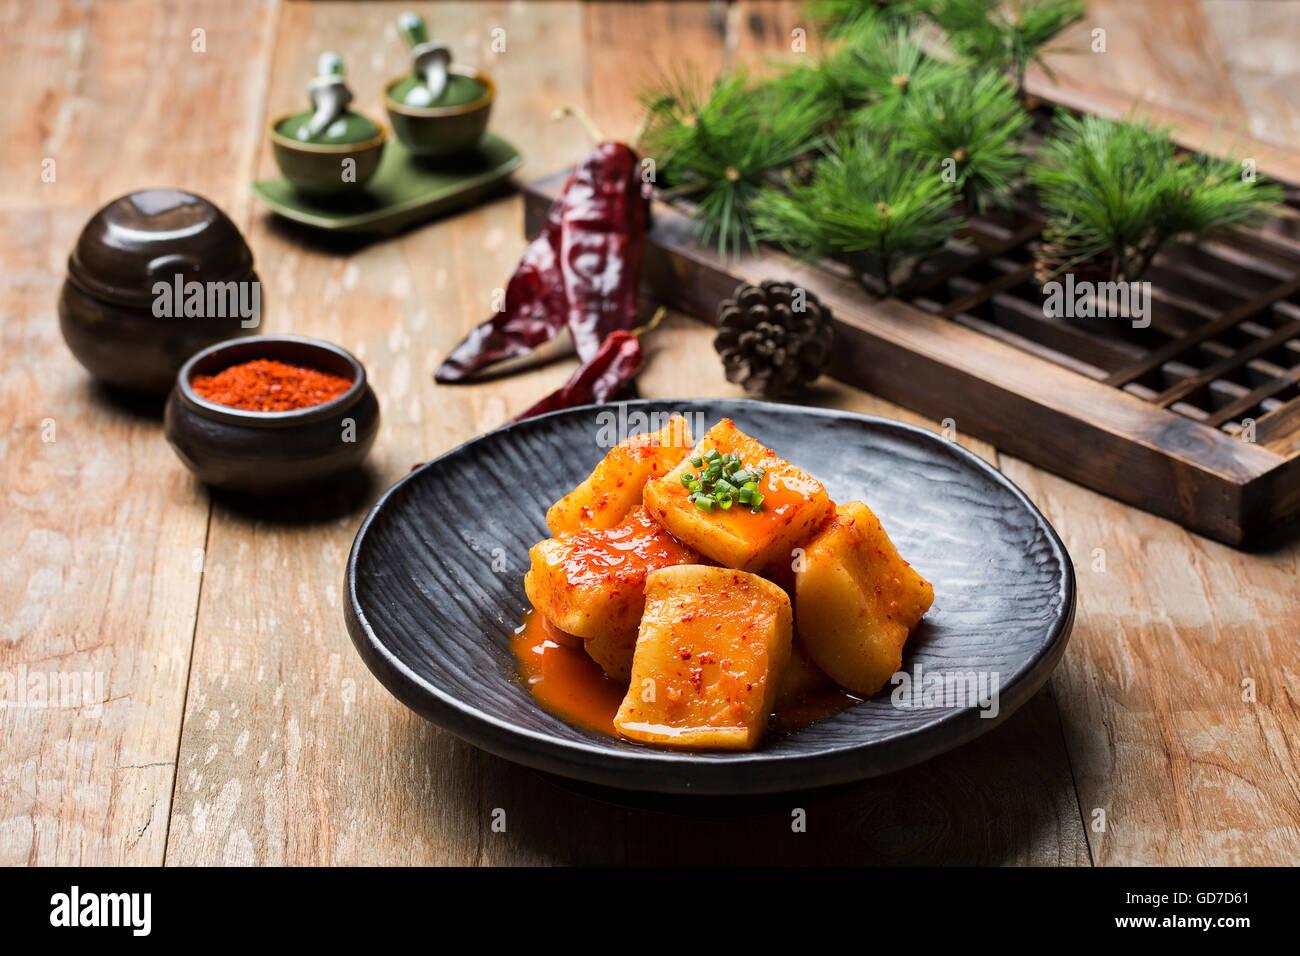 Korean Traditional Food - Kimchi (Fermented/Pickled Radish, Asian Cuisine) - Stock Image